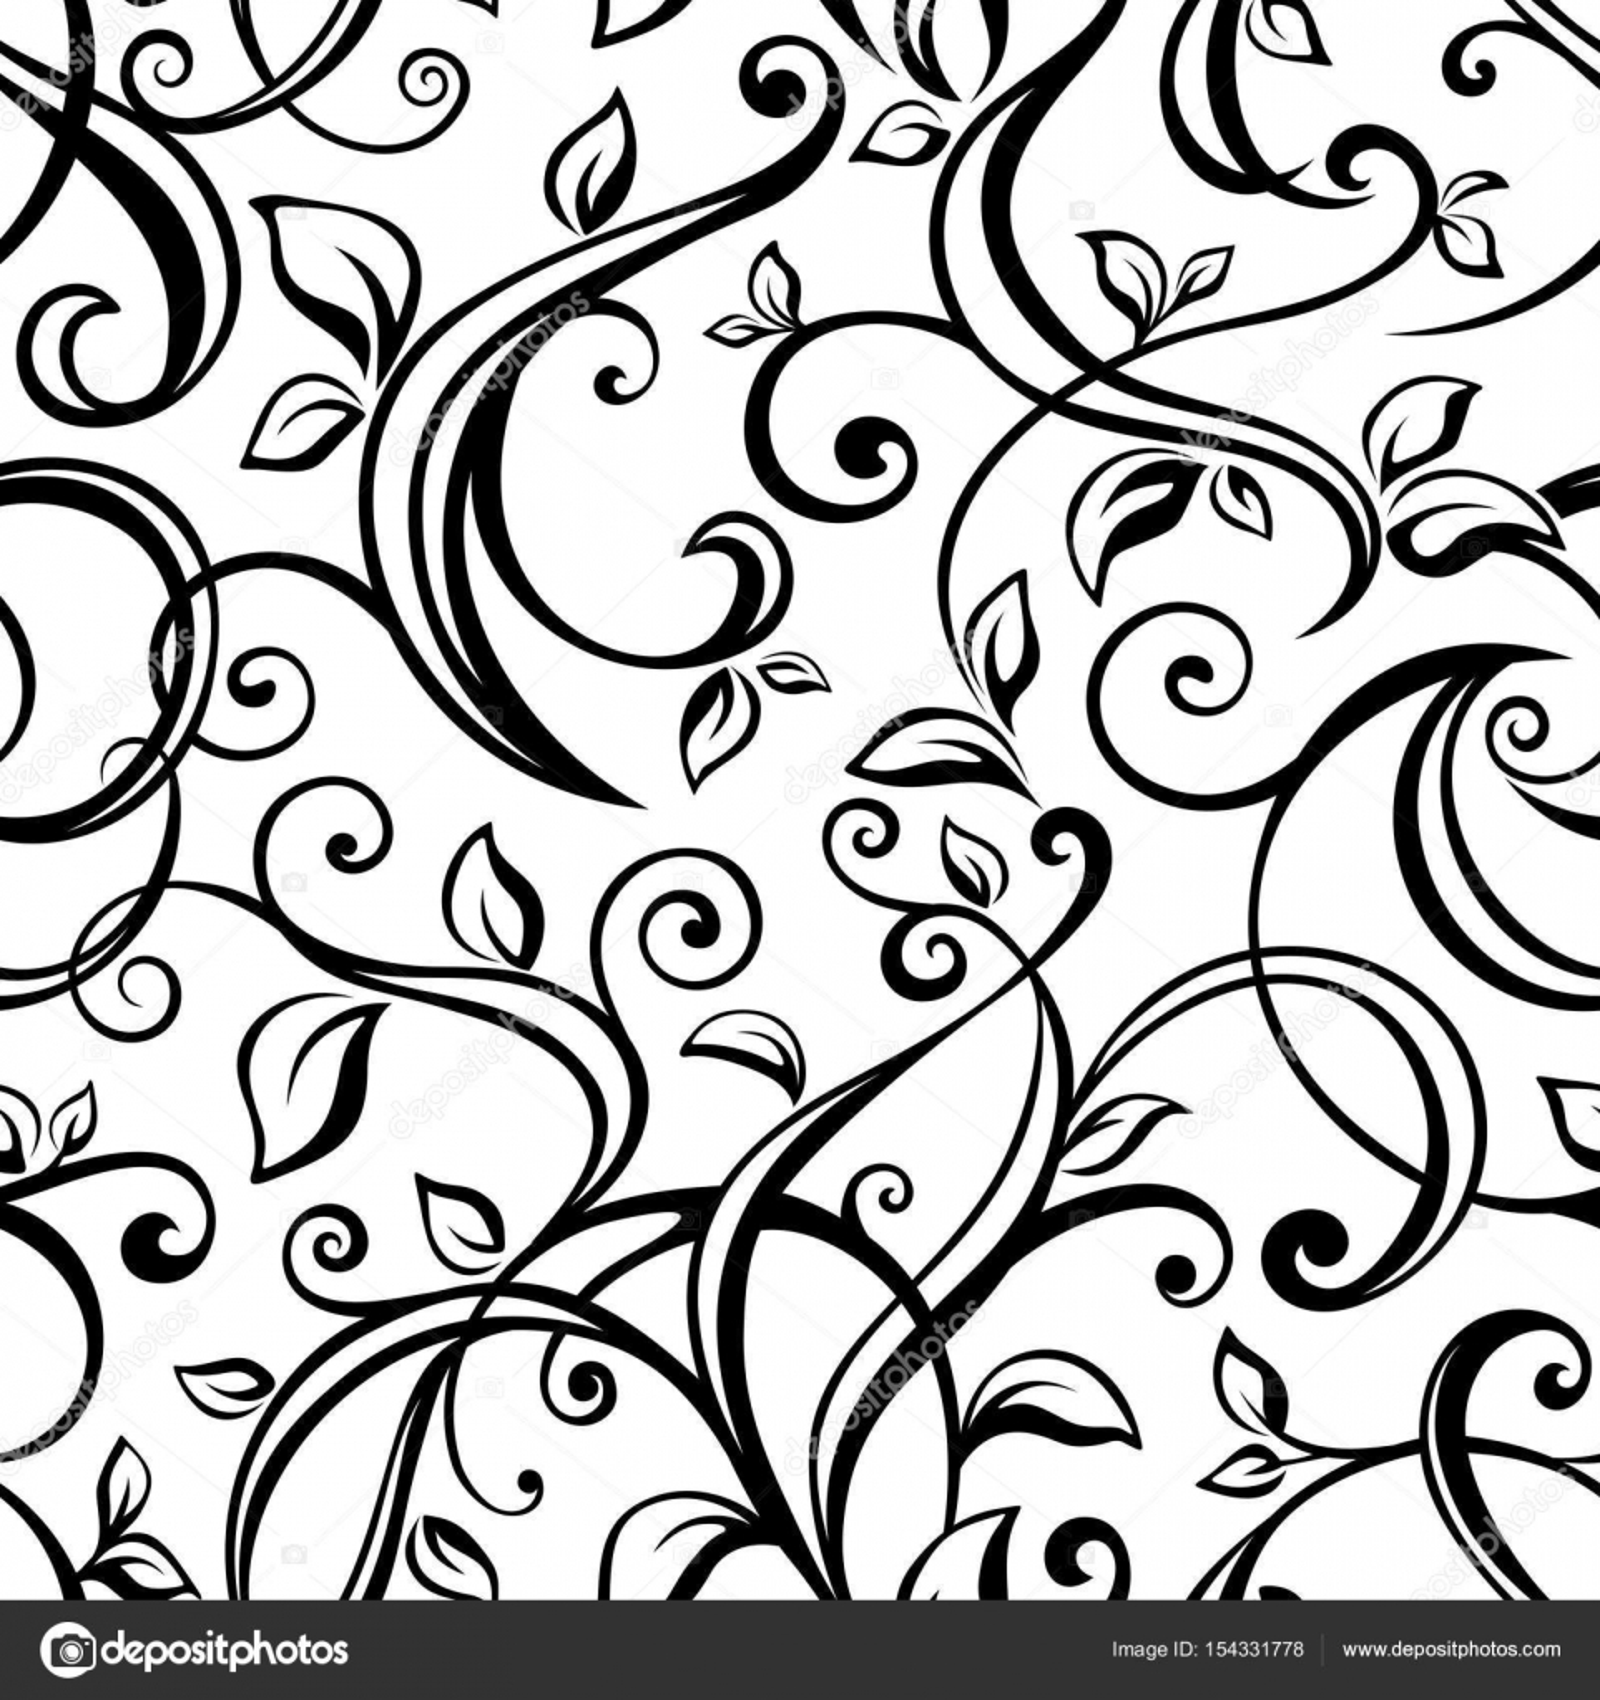 seamless black and white floral pattern vector illustration rh depositphotos com flower pattern vector floral pattern vector illustration